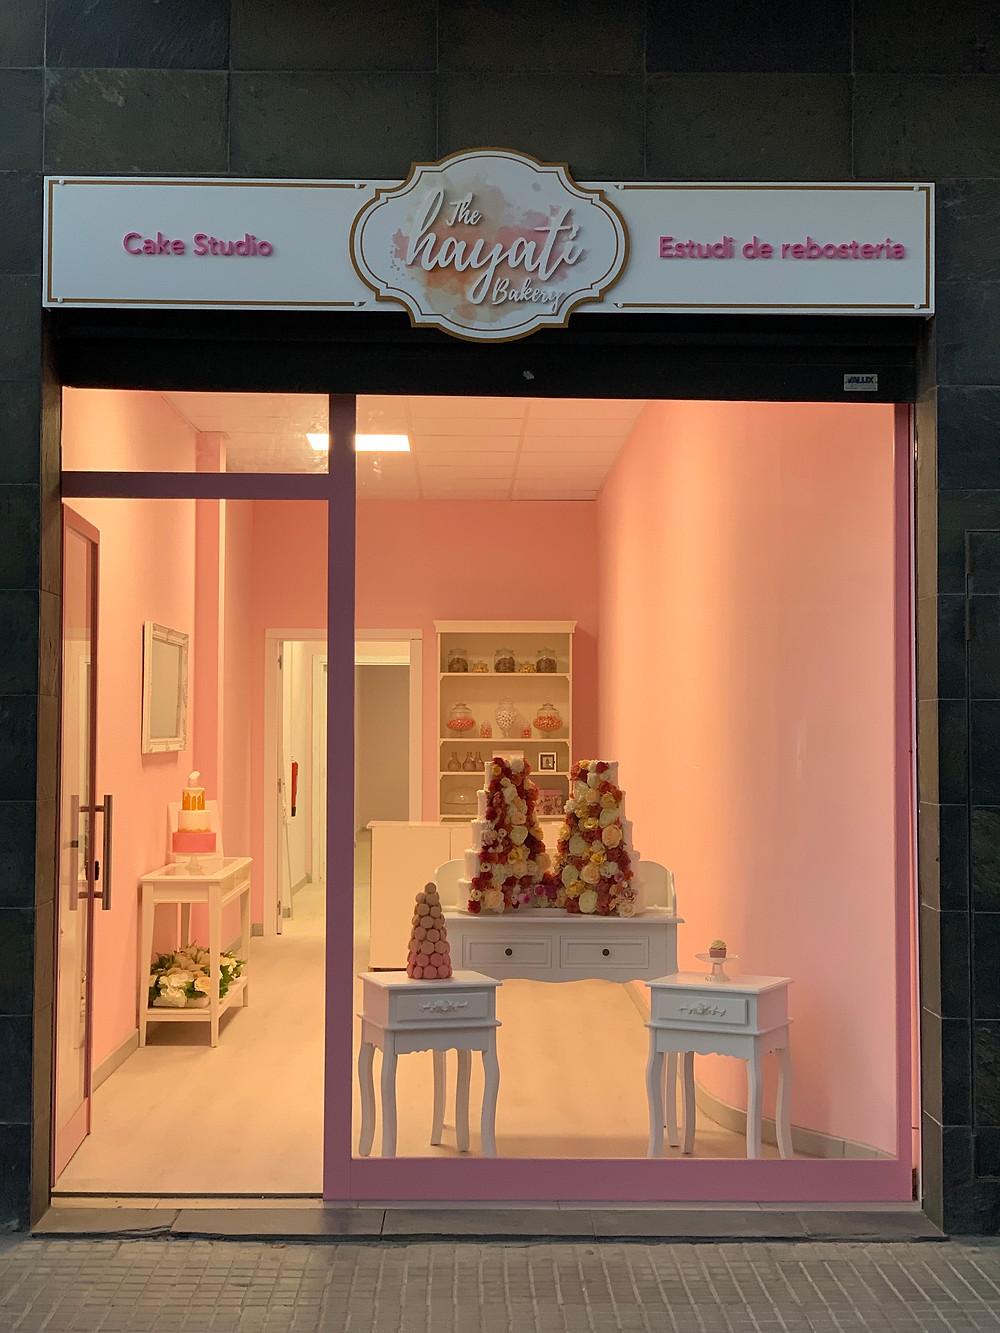 the hayati bakery shop, cake, pasteleria, pasteleros creativa, Maresme, Calella